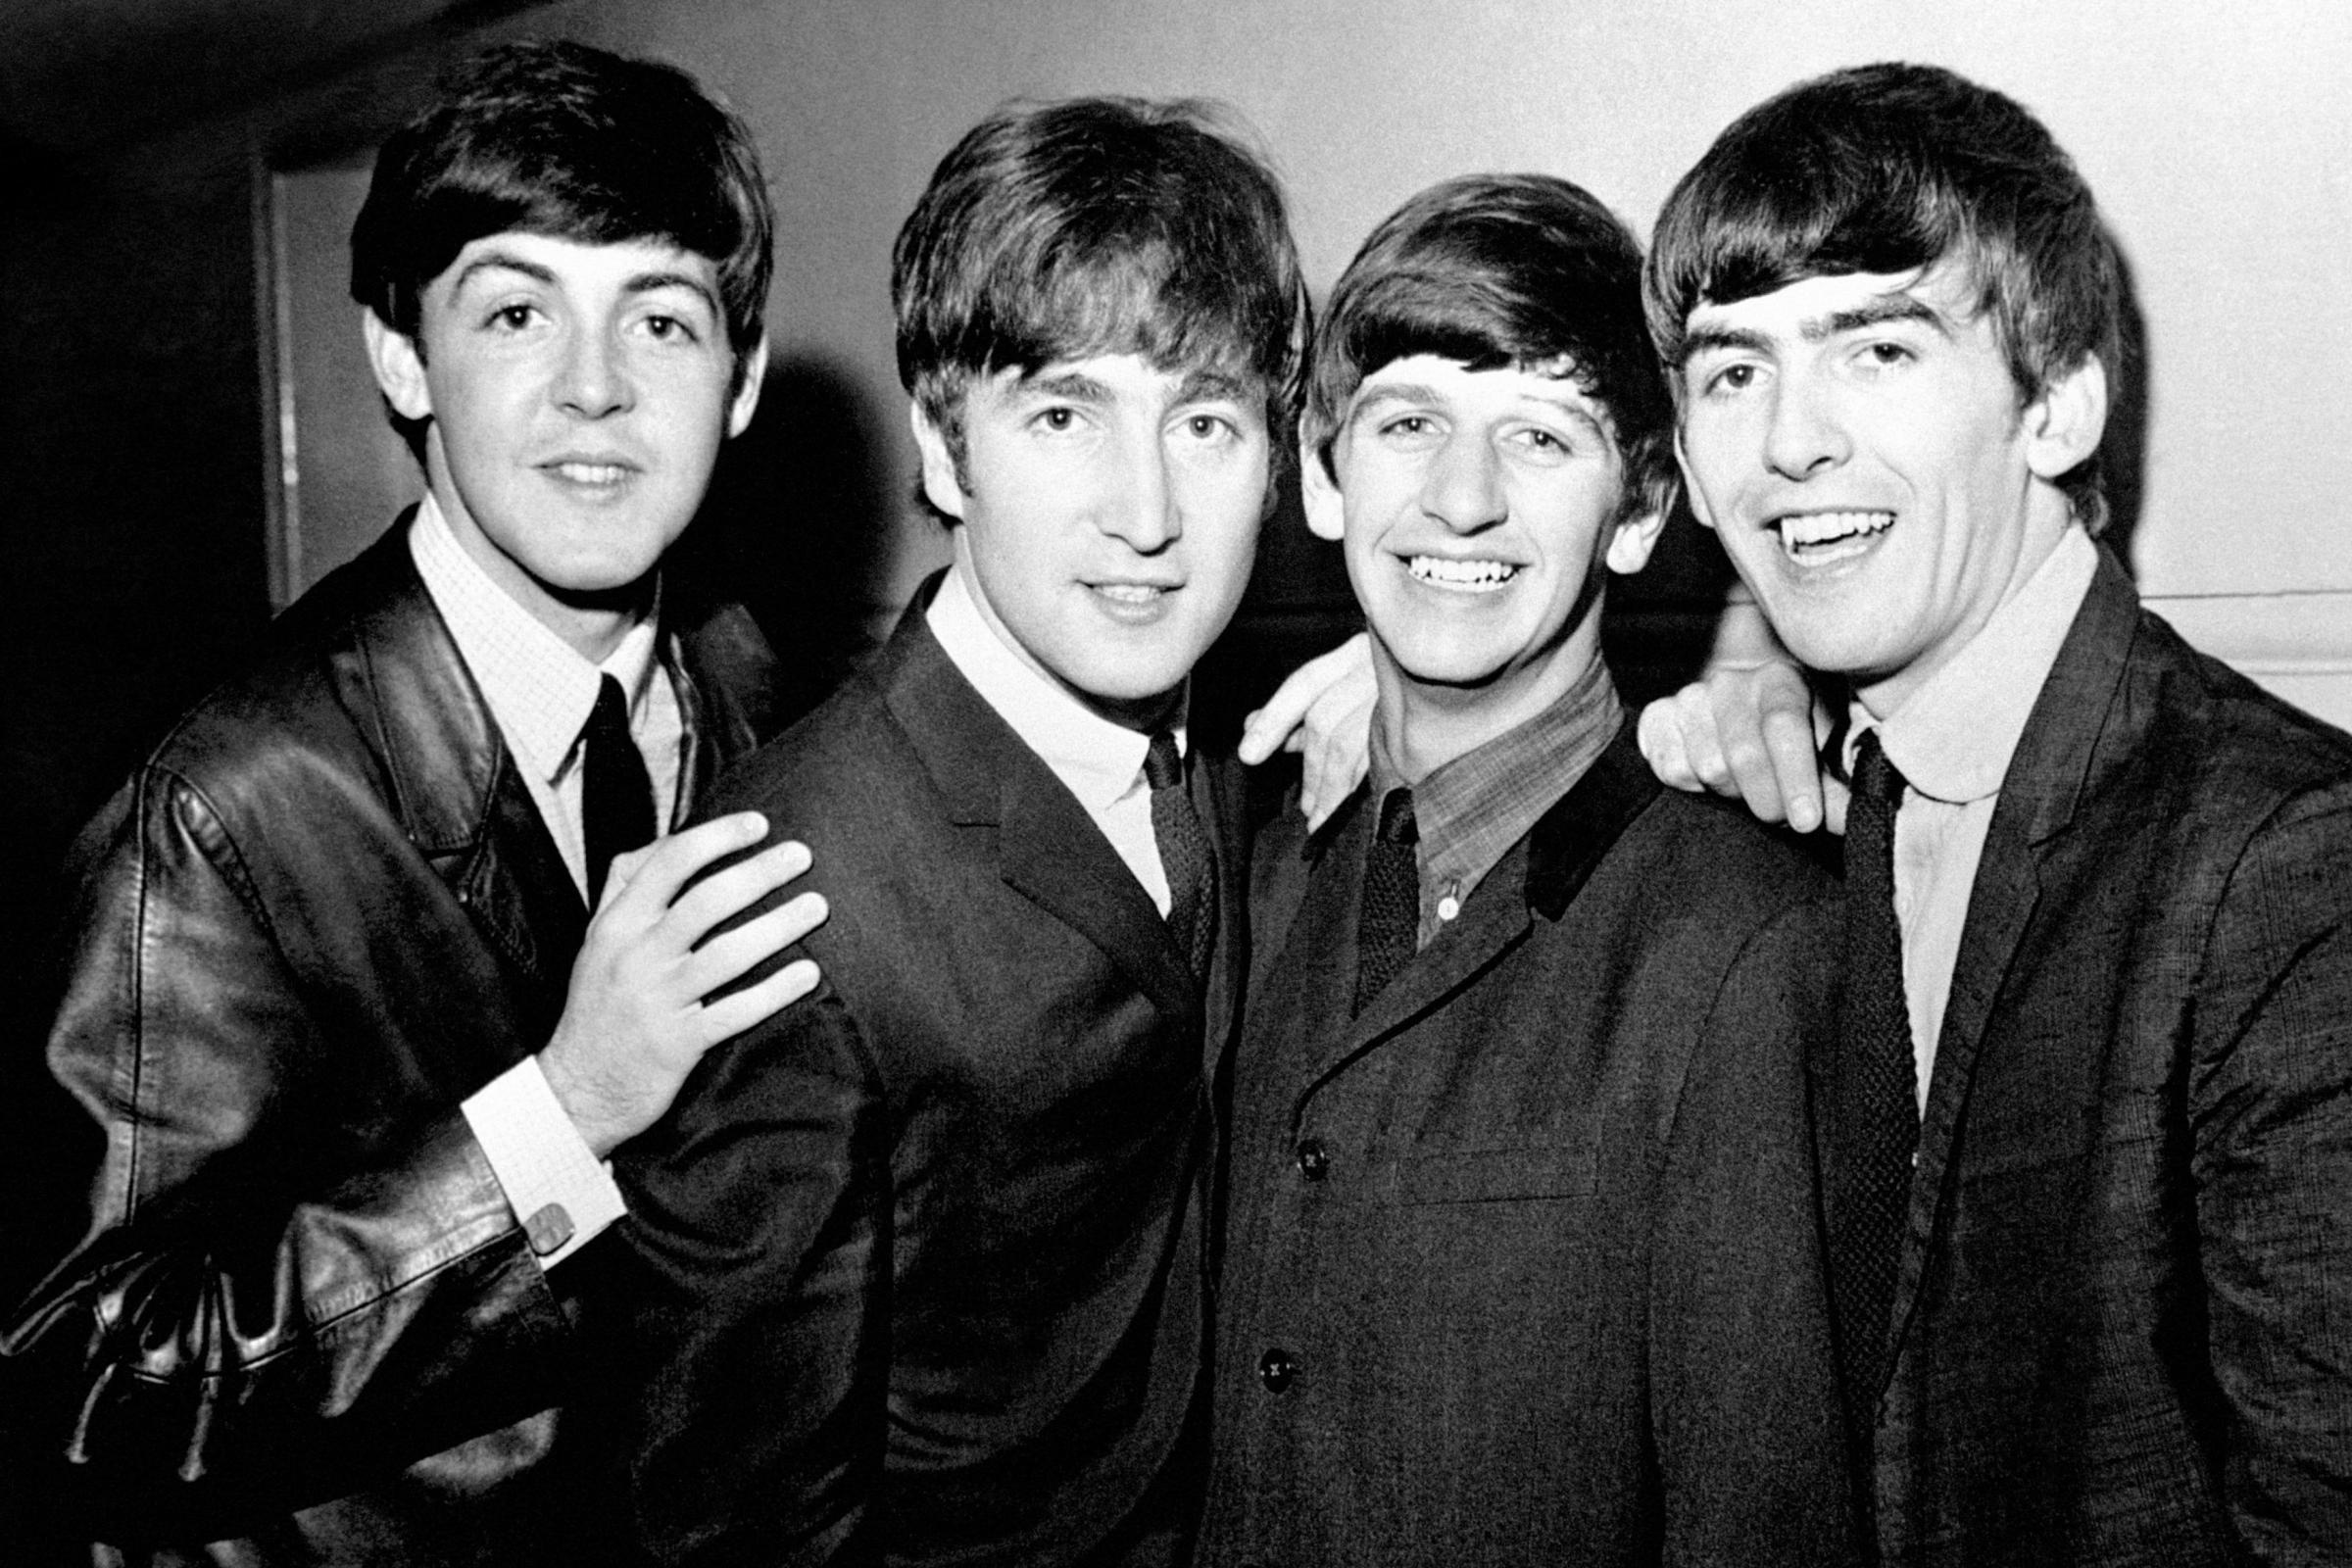 Lennon S Aunt Dismissed Beatles Fascination With Indian Guru Bridgwater Mercury